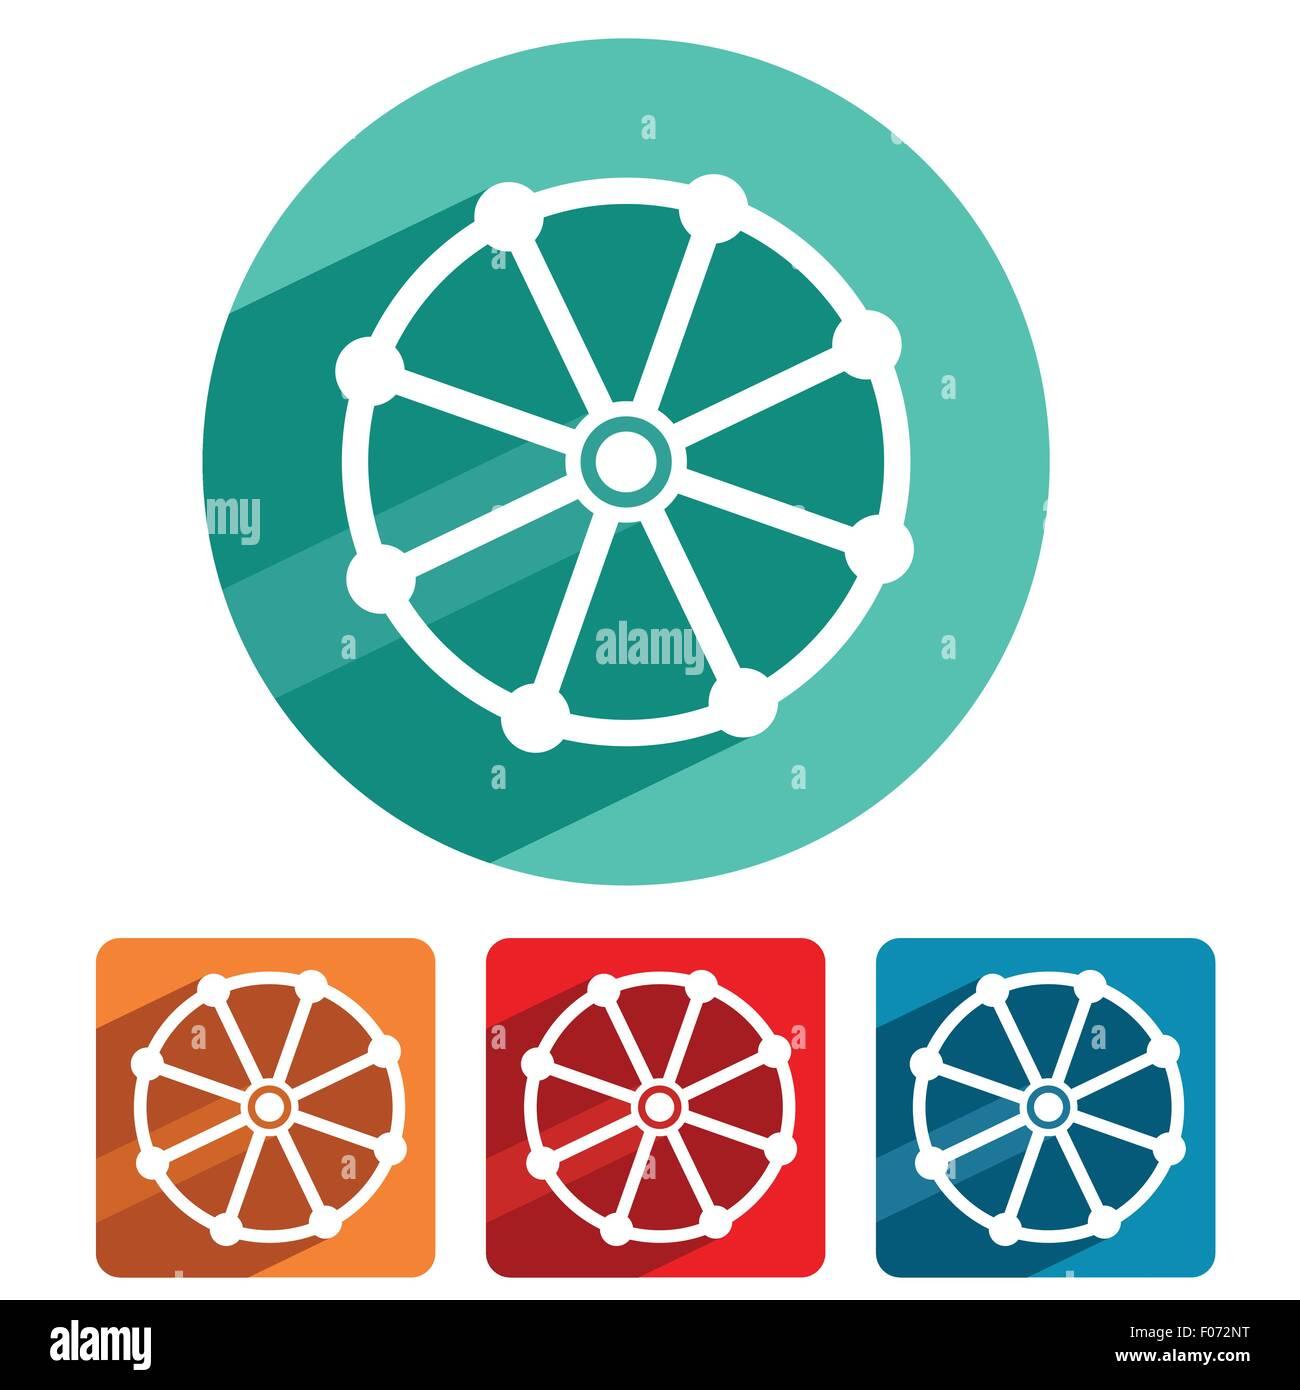 Buddhism symbol icon flat design vector illustration. - Stock Image